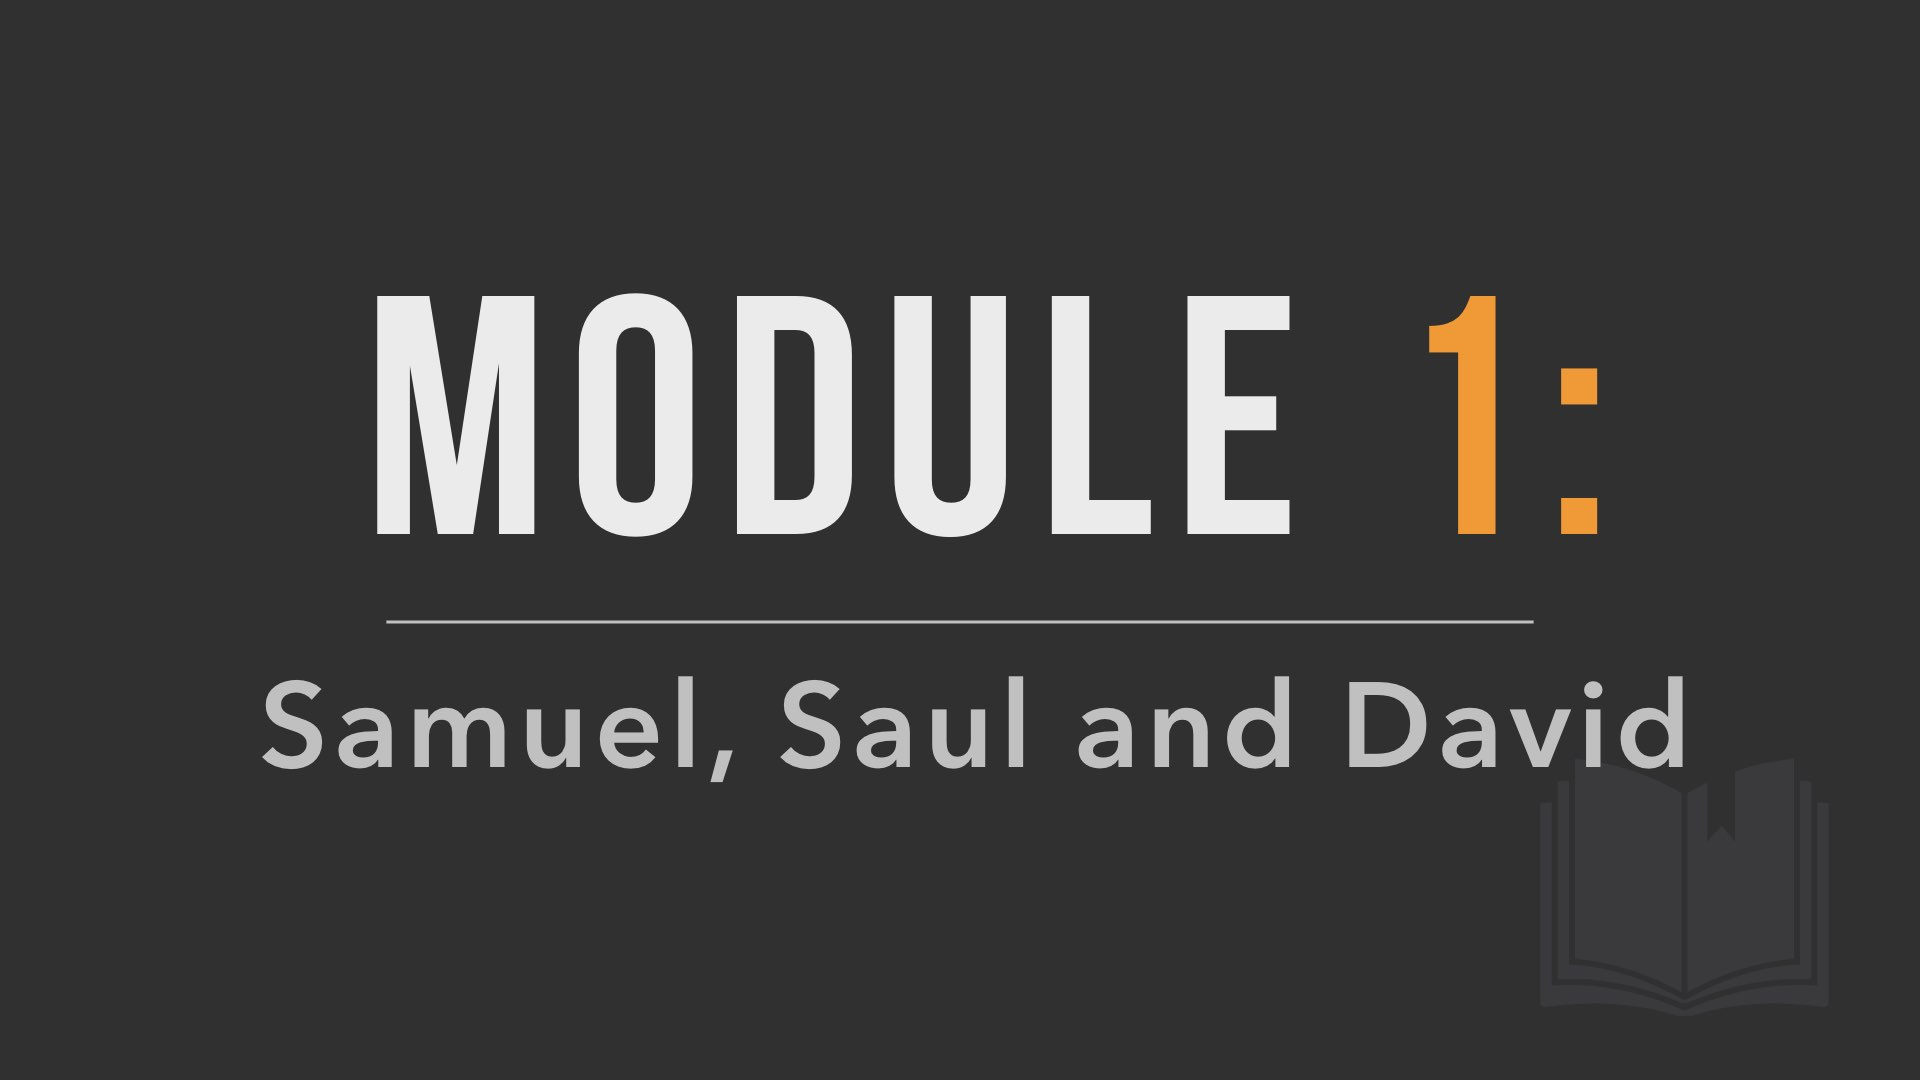 Module 1 Poster Image